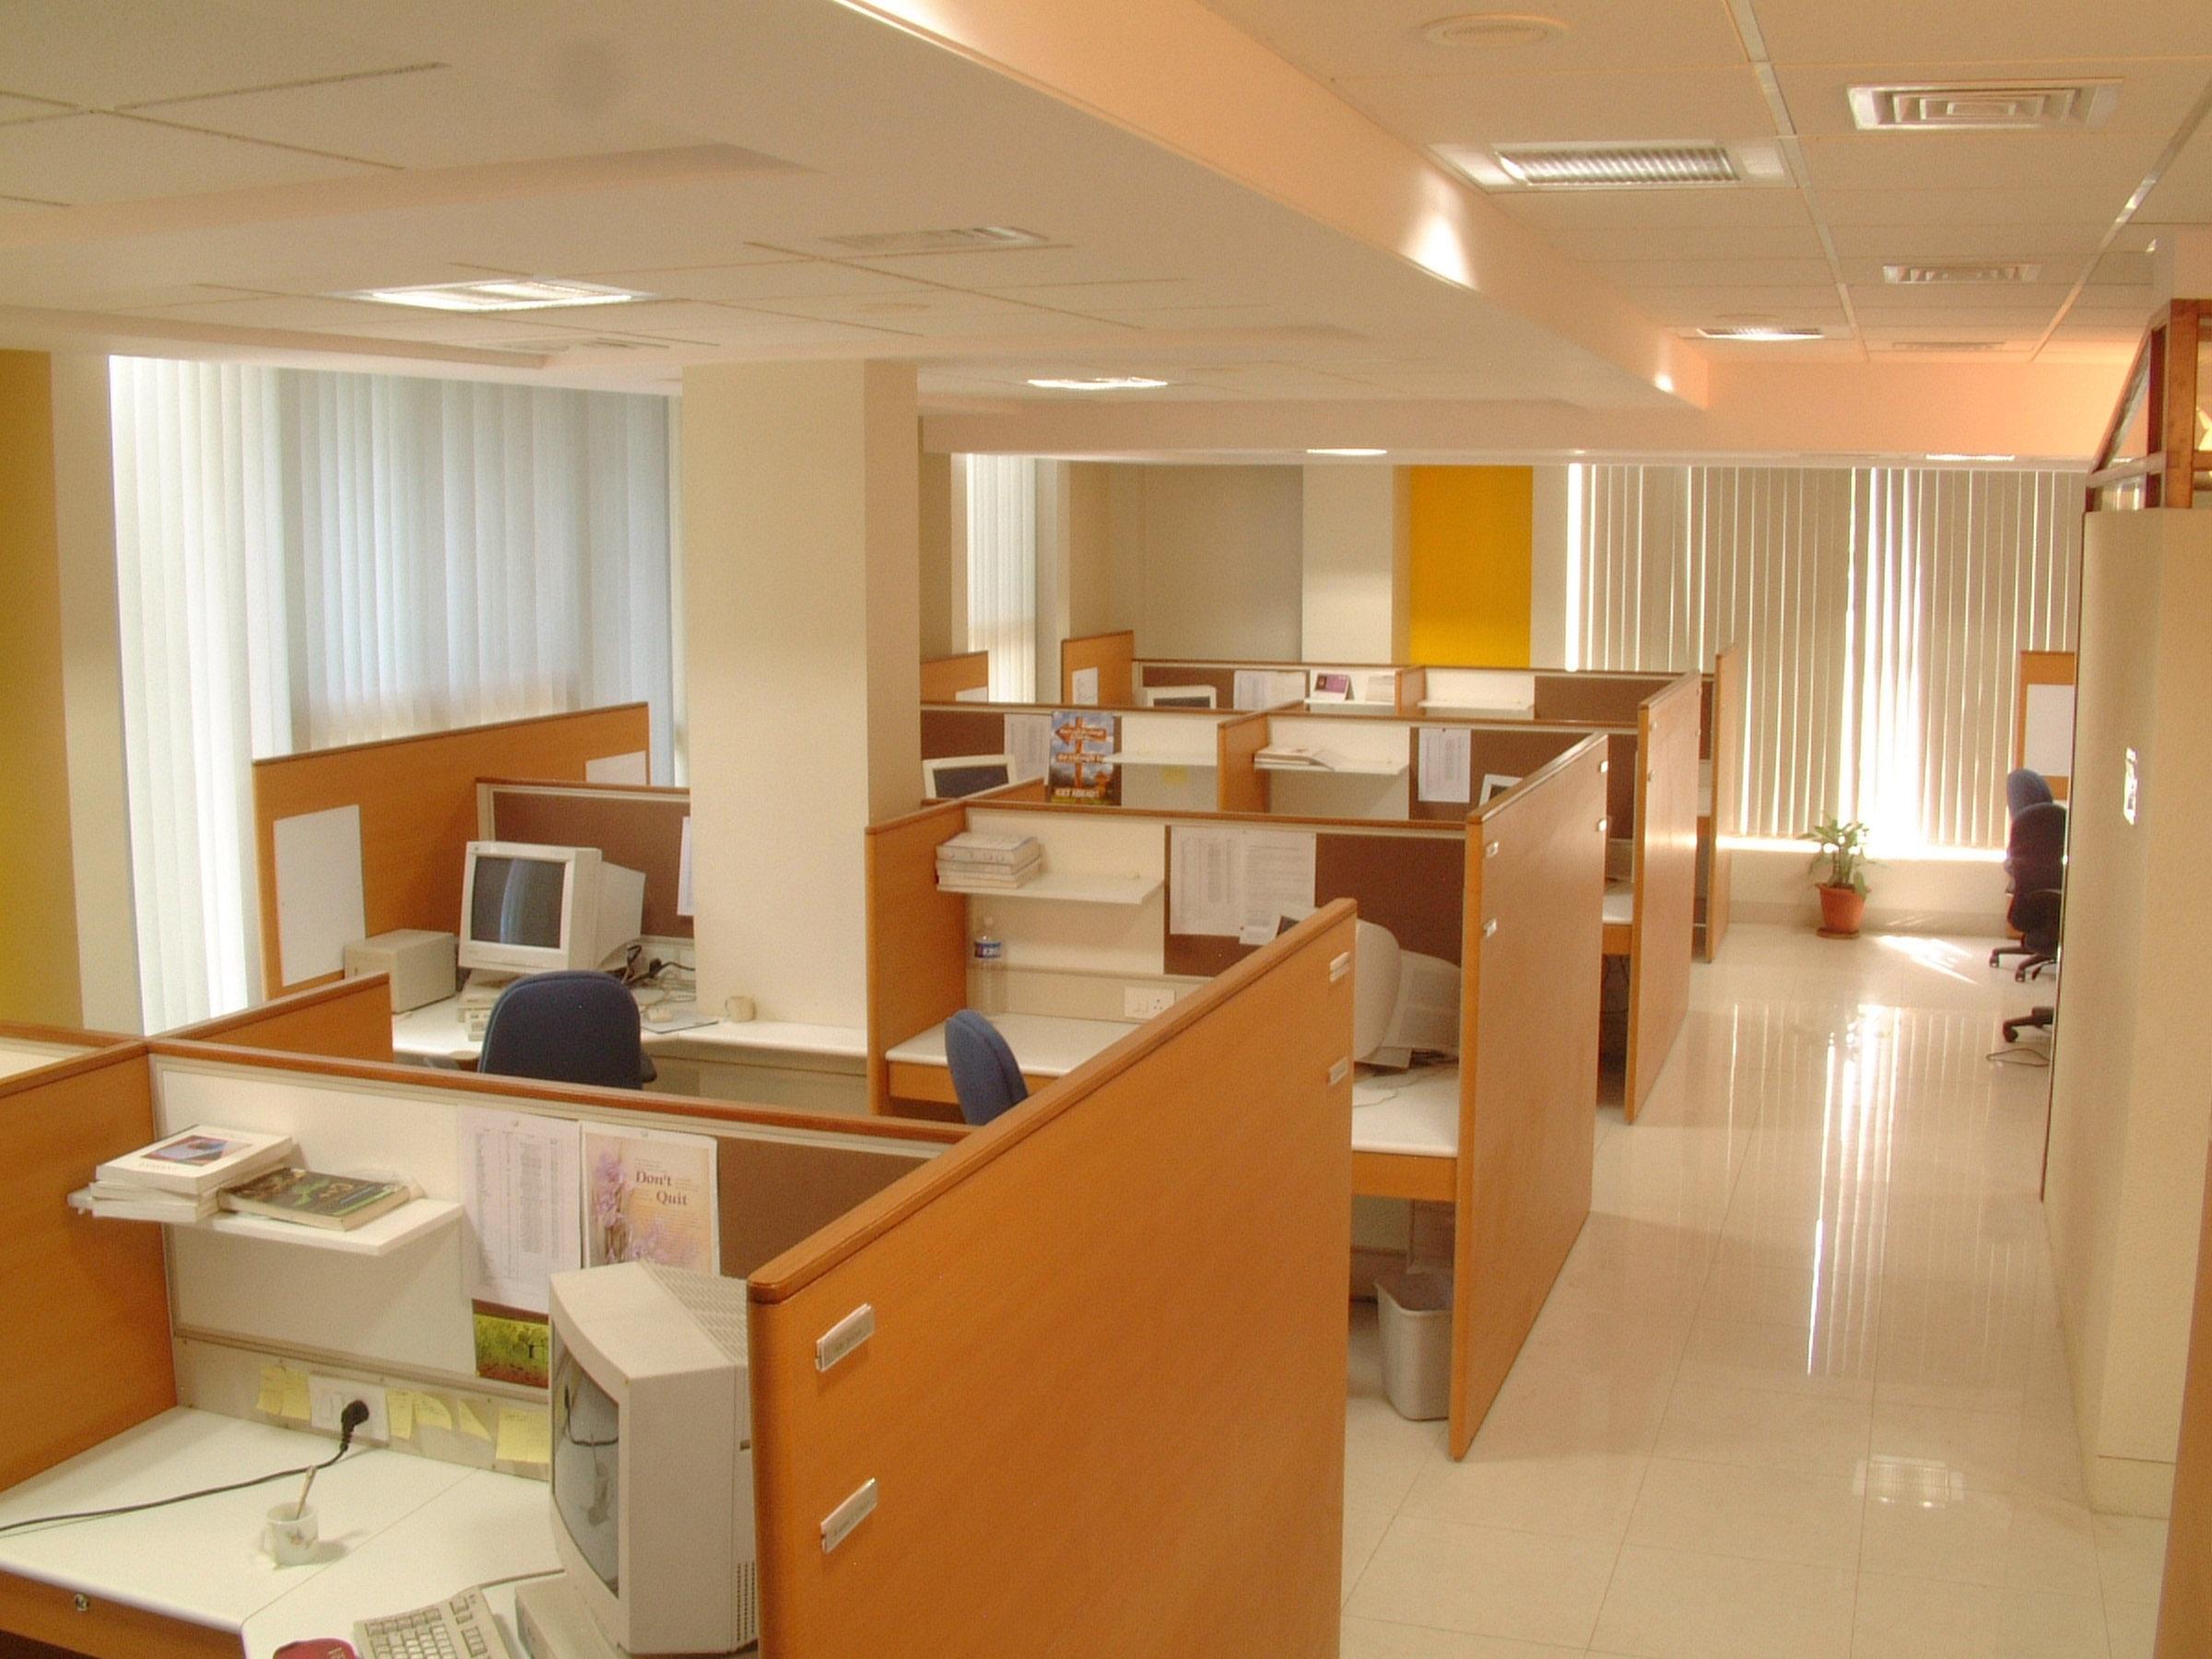 Building Space Office Property Room Classroom Interior Design Design Real Estate Noida